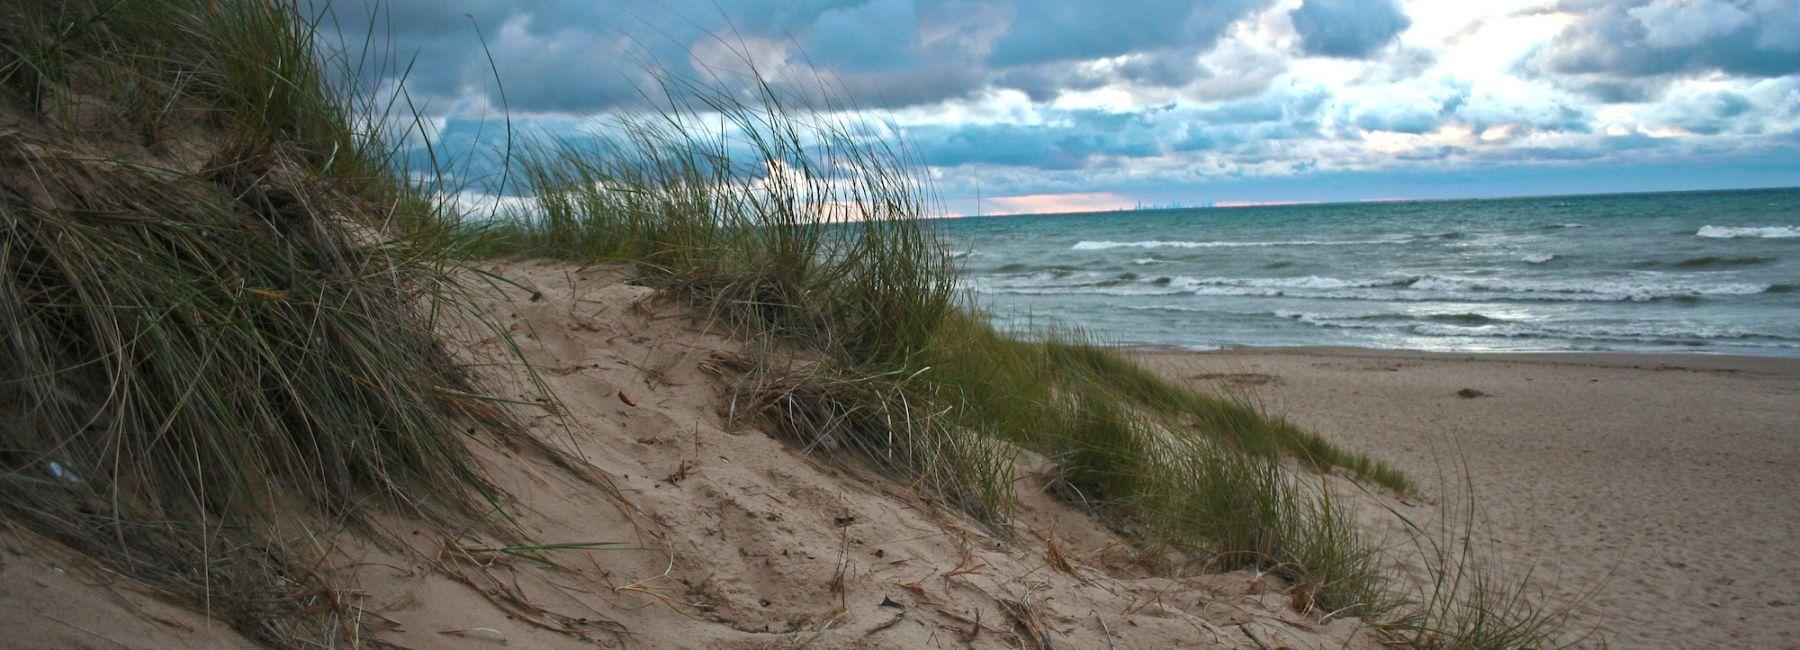 Indiana Dunes Sky